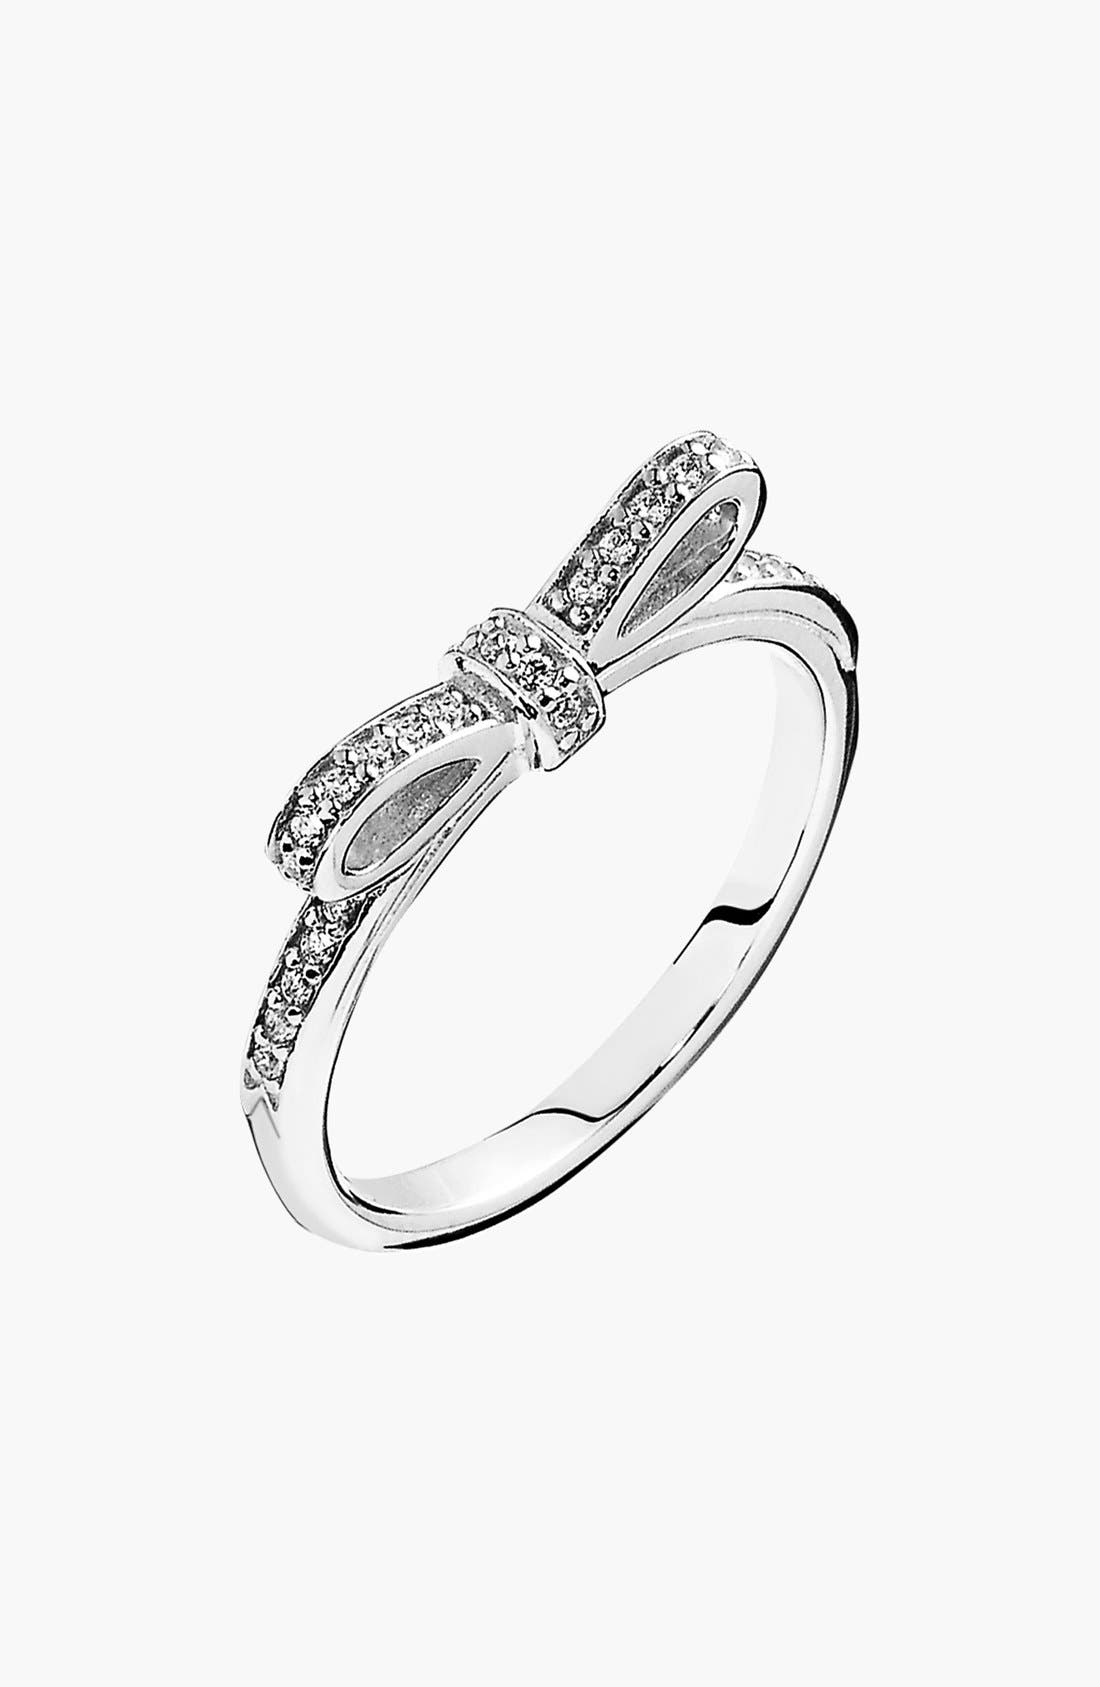 Alternate Image 1 Selected - PANDORA 'Sparkling Bow' Ring